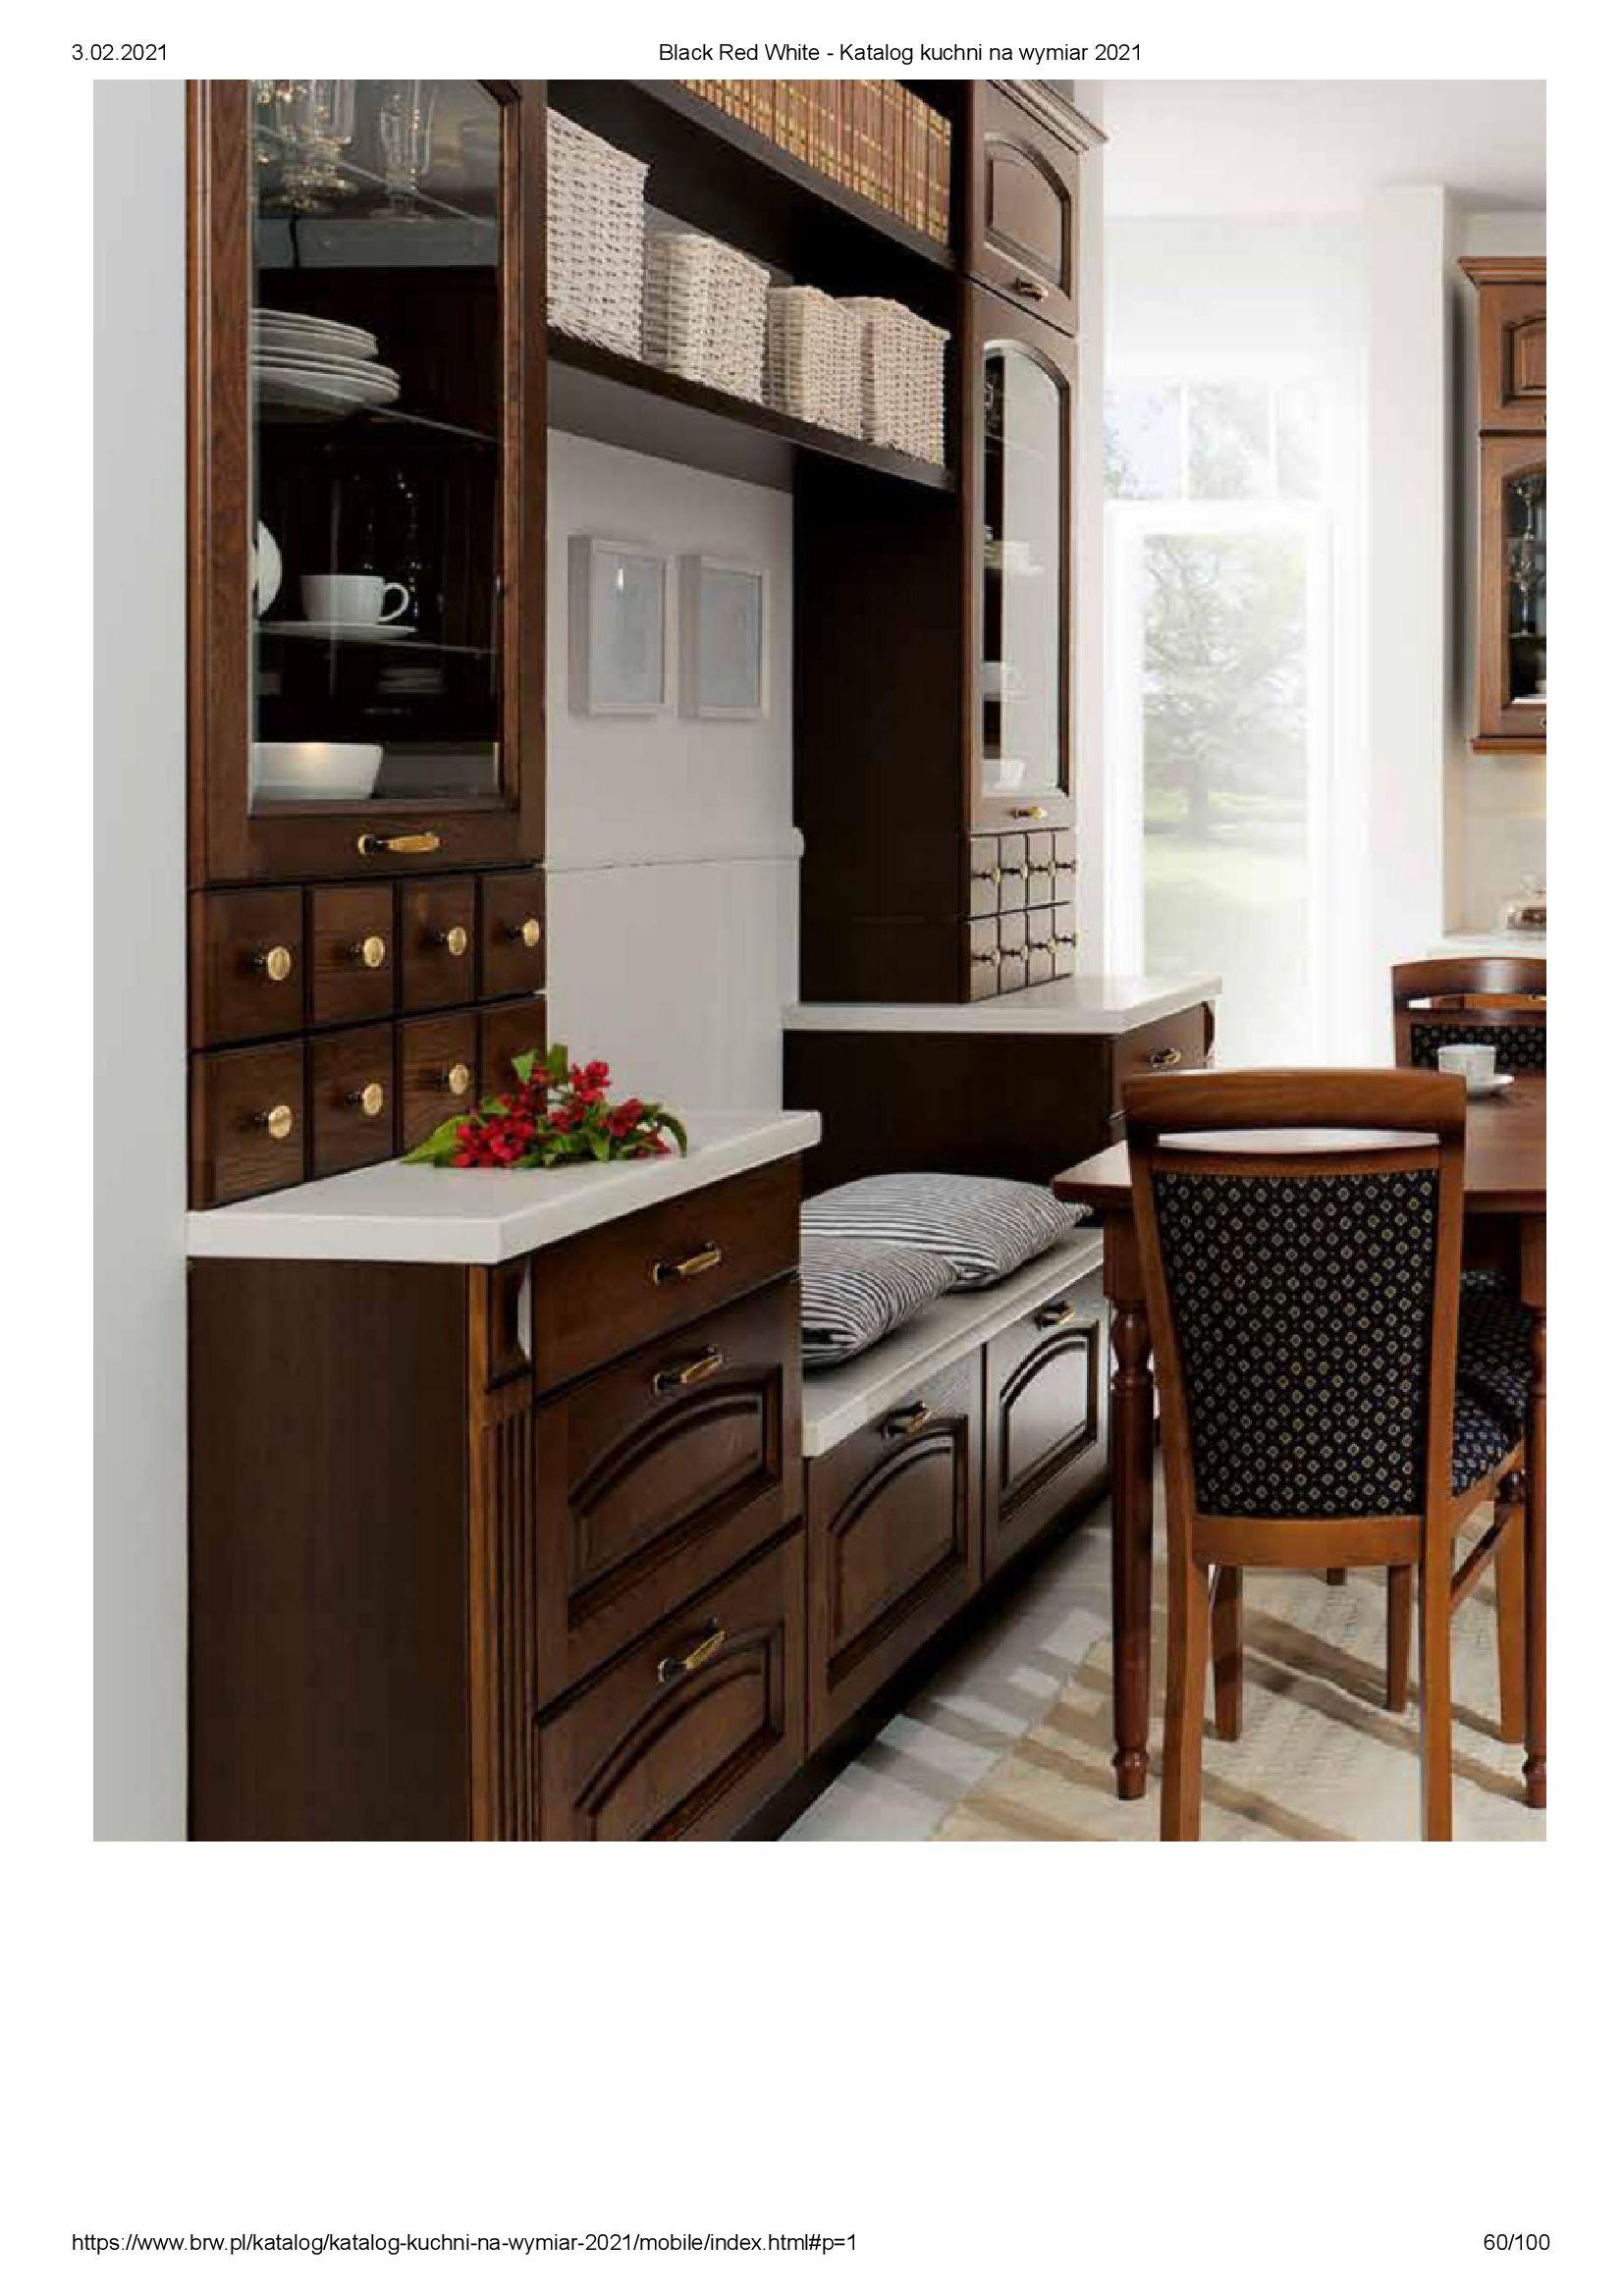 Gazetka Black Red White: Katalog - Kuchnie na wymiar Senso Kitchens 2021 2021-01-01 page-60